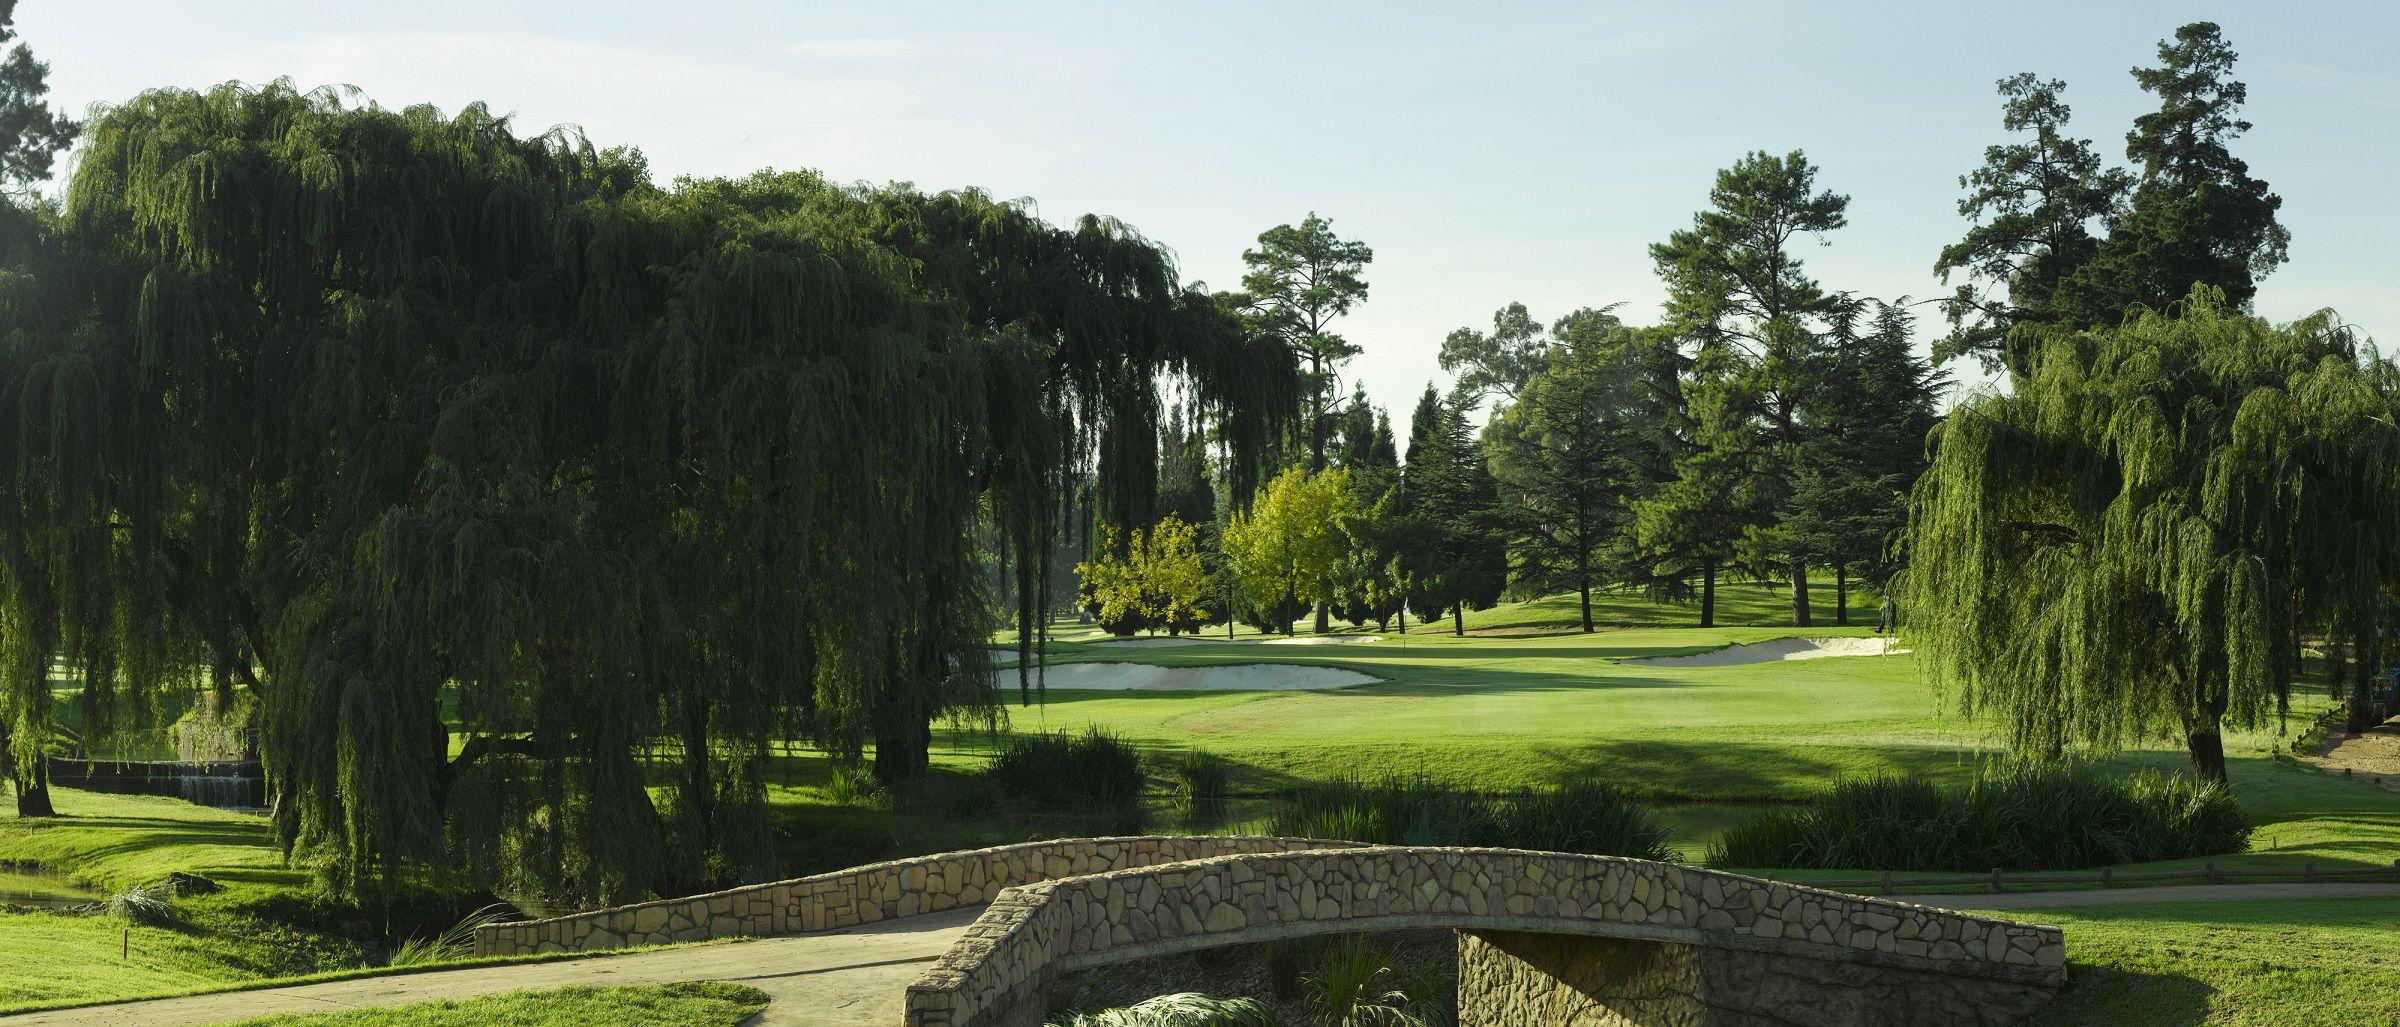 Glendower golf club cover picture